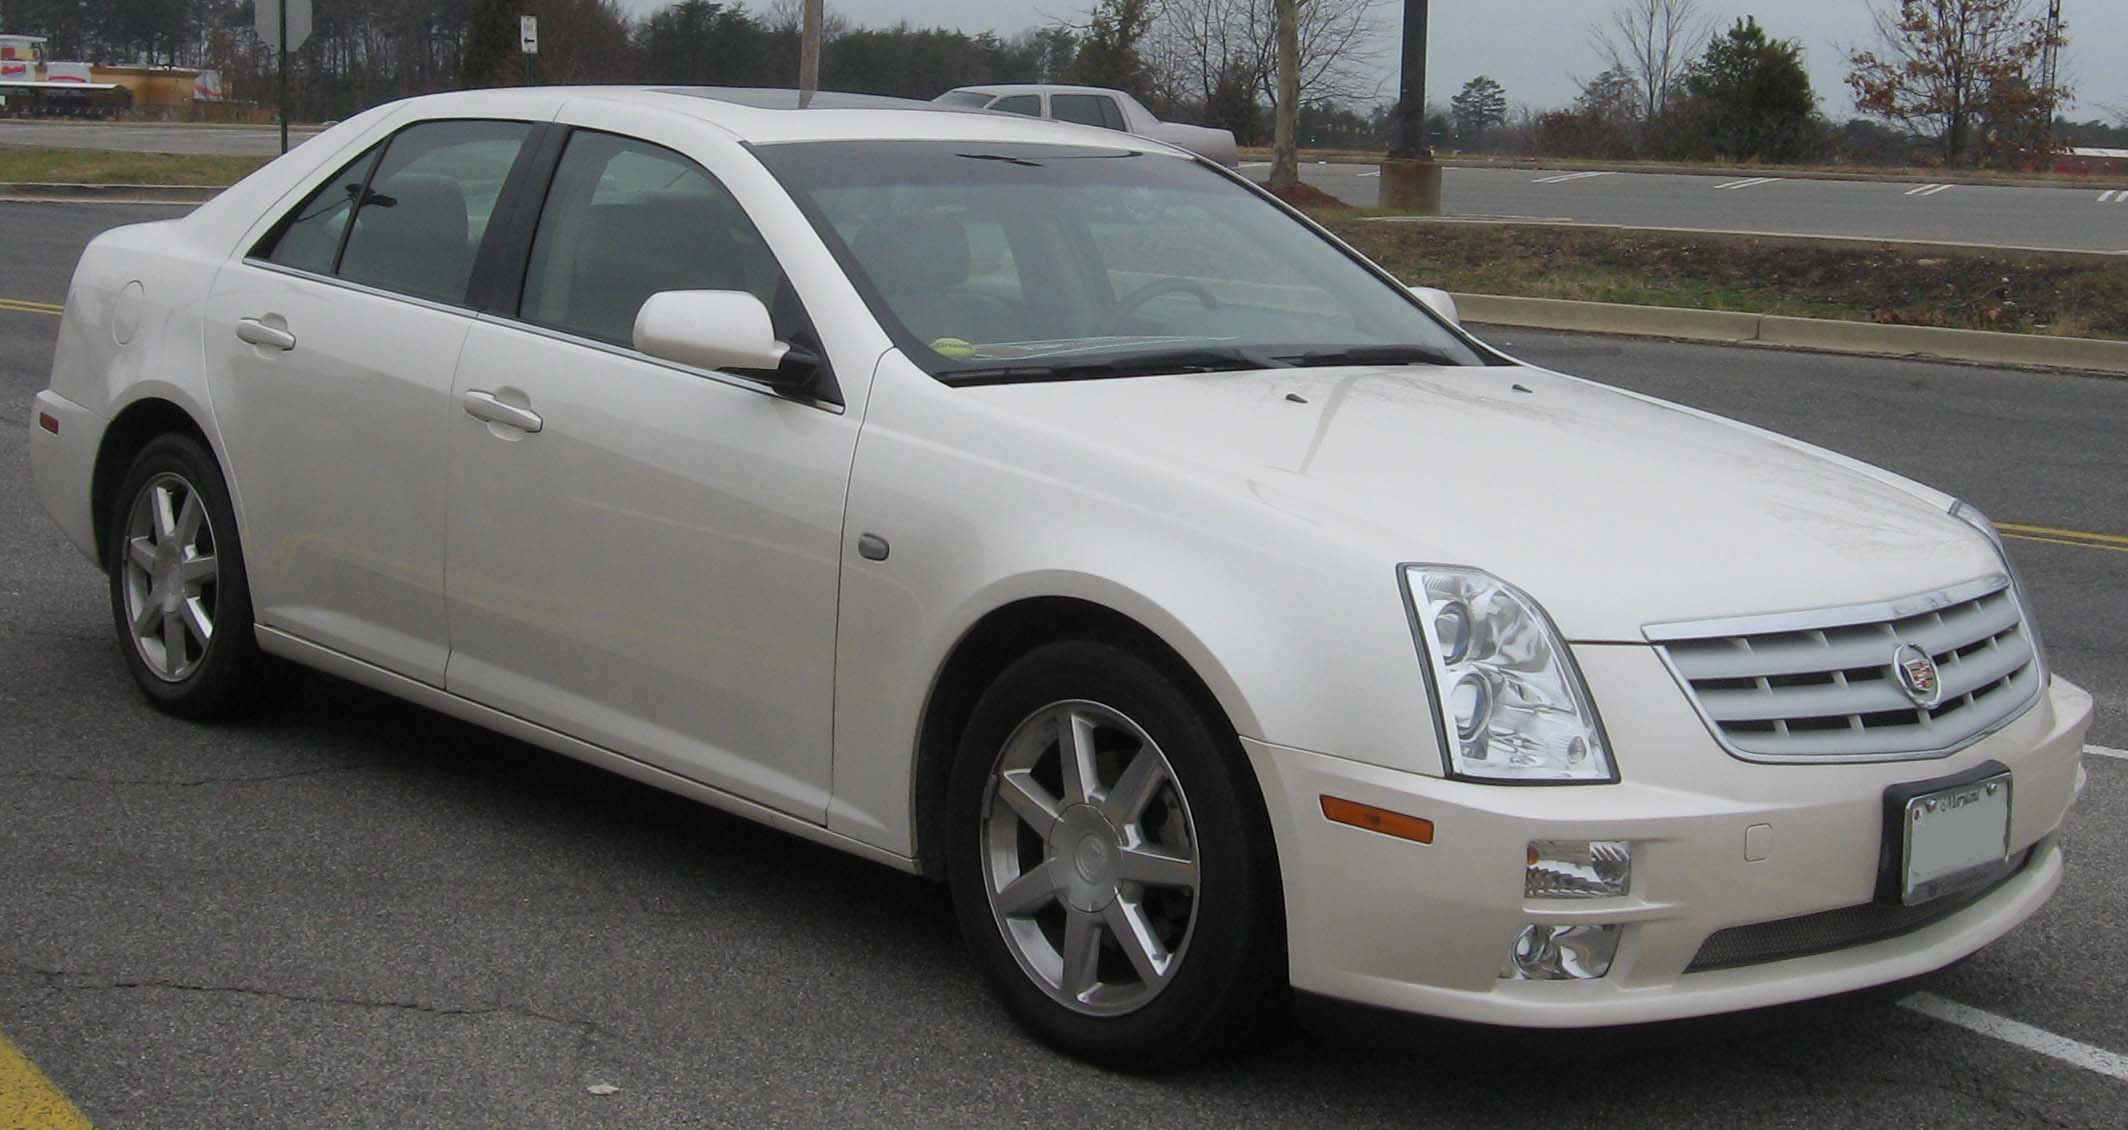 File:2005-2007 Cadillac STS.jpg - Wikipedia